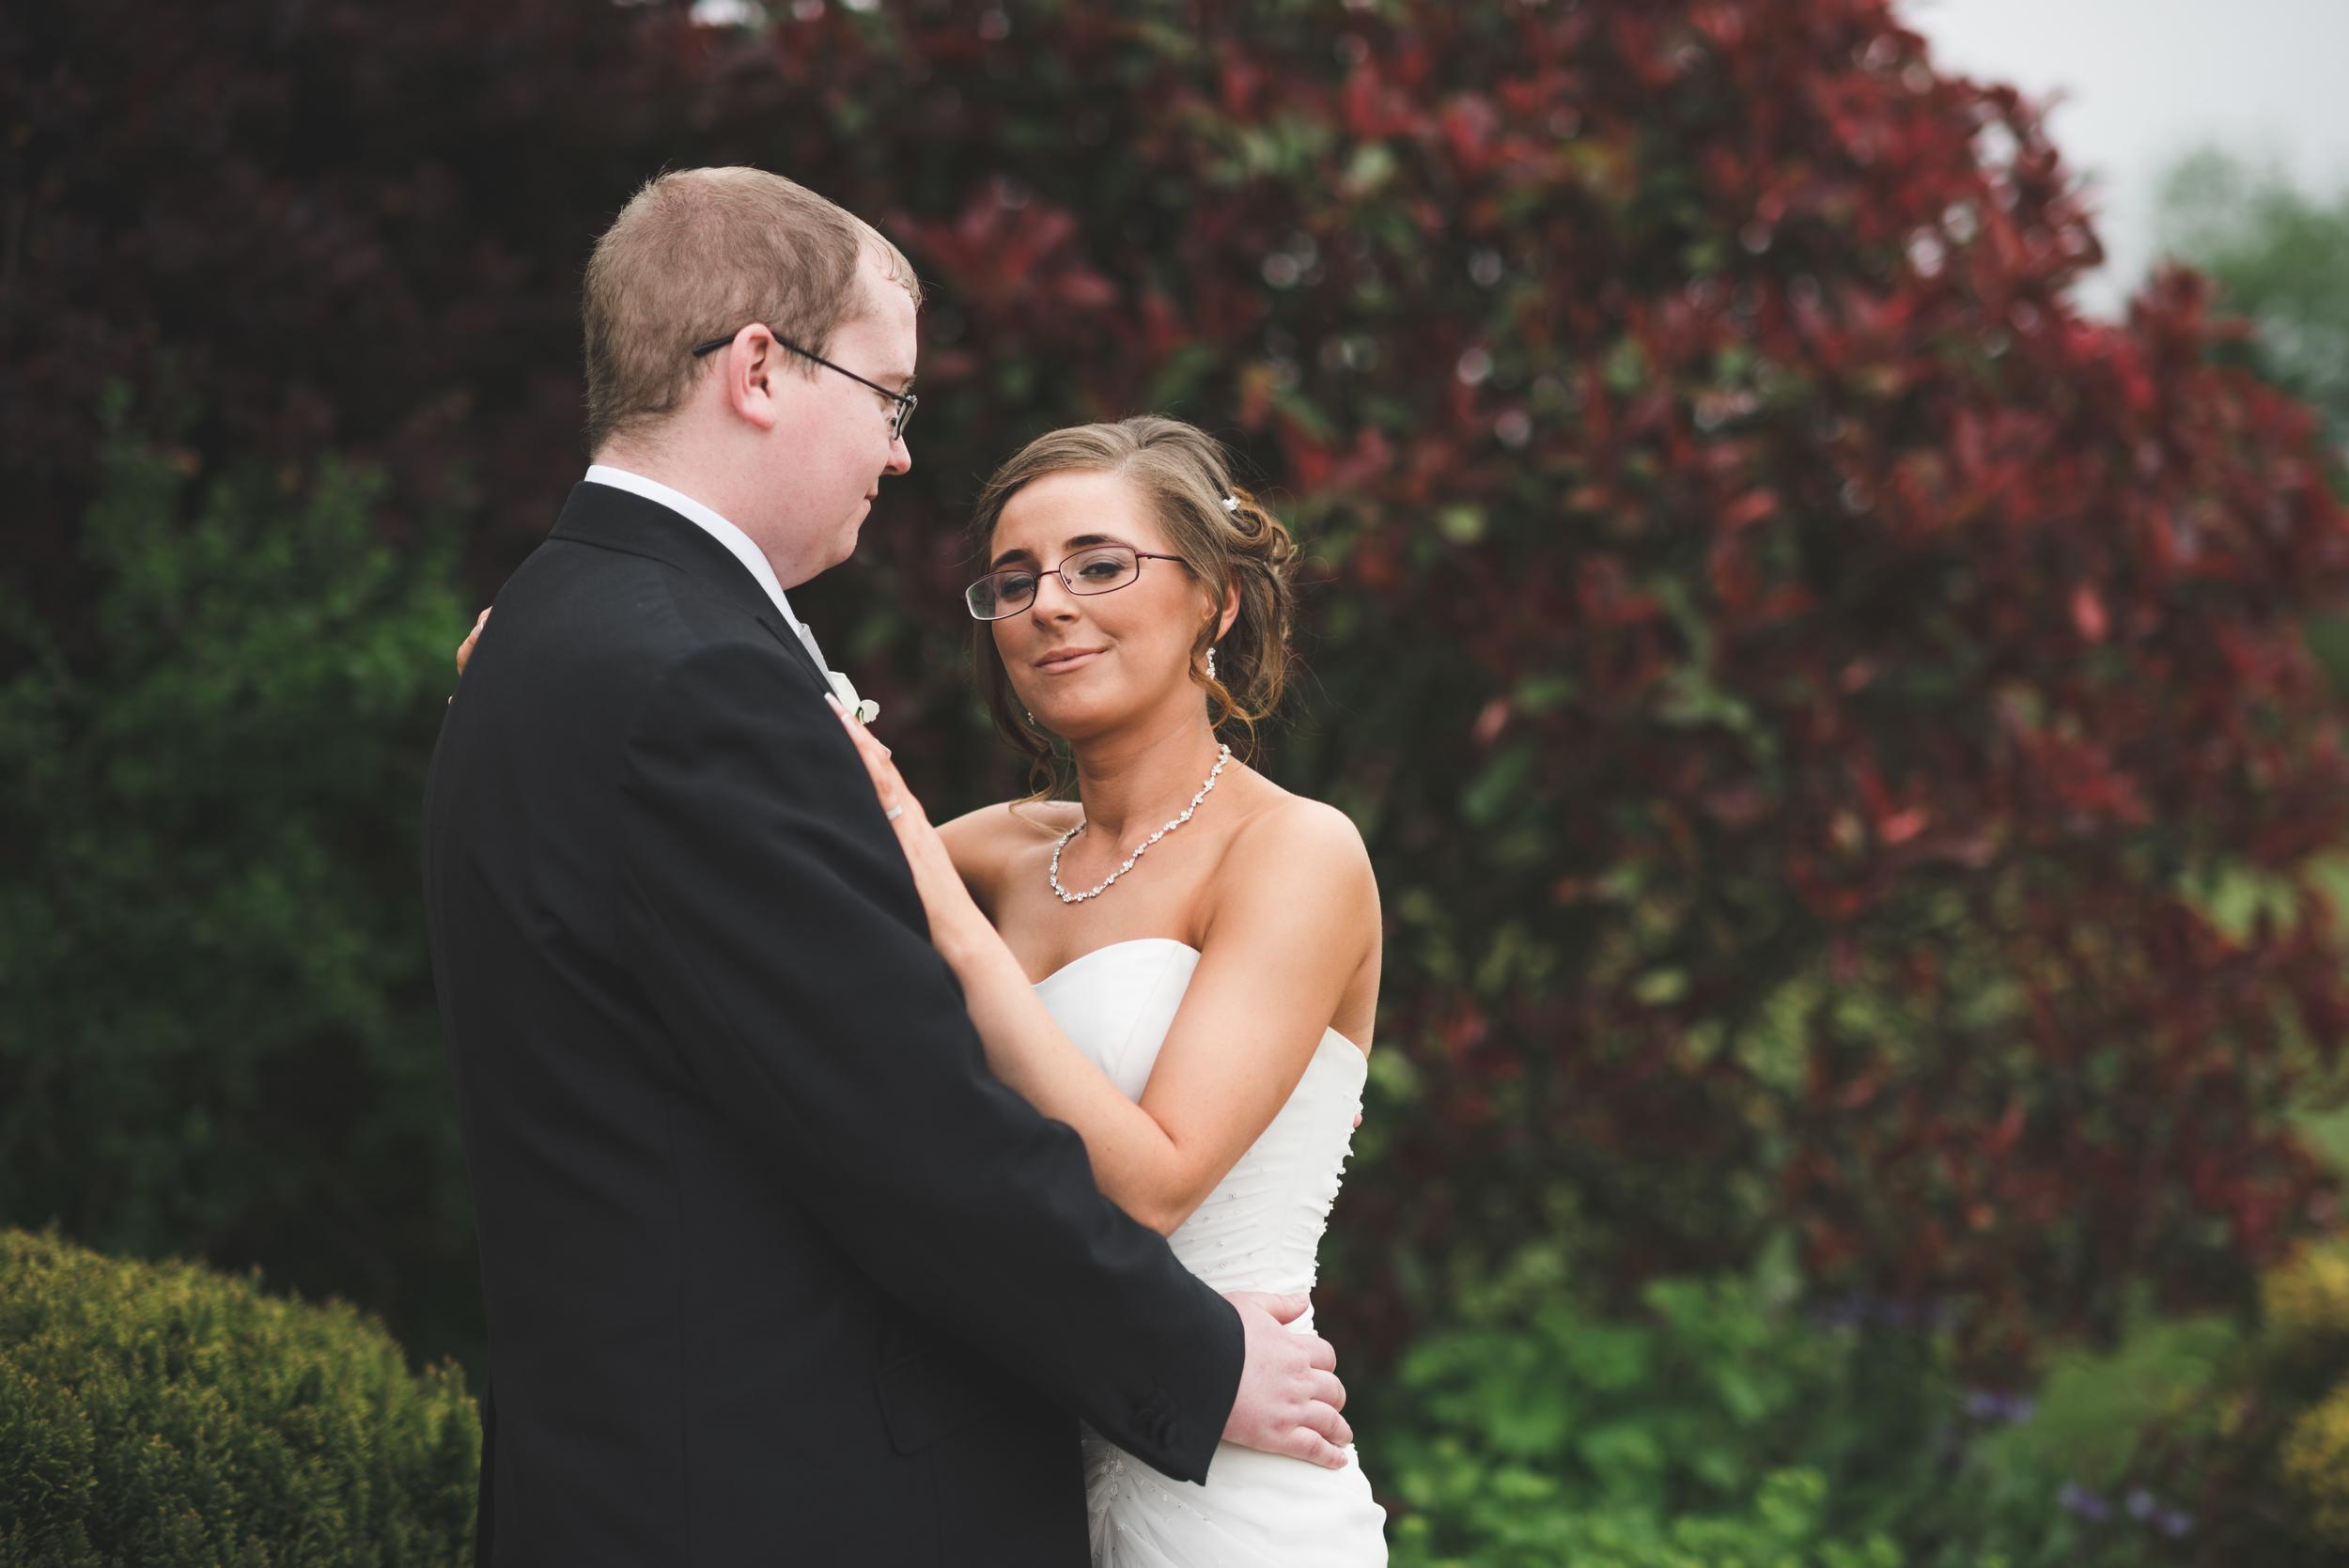 Ballymac_hotel_wedding_lisburn_bride_groom_married